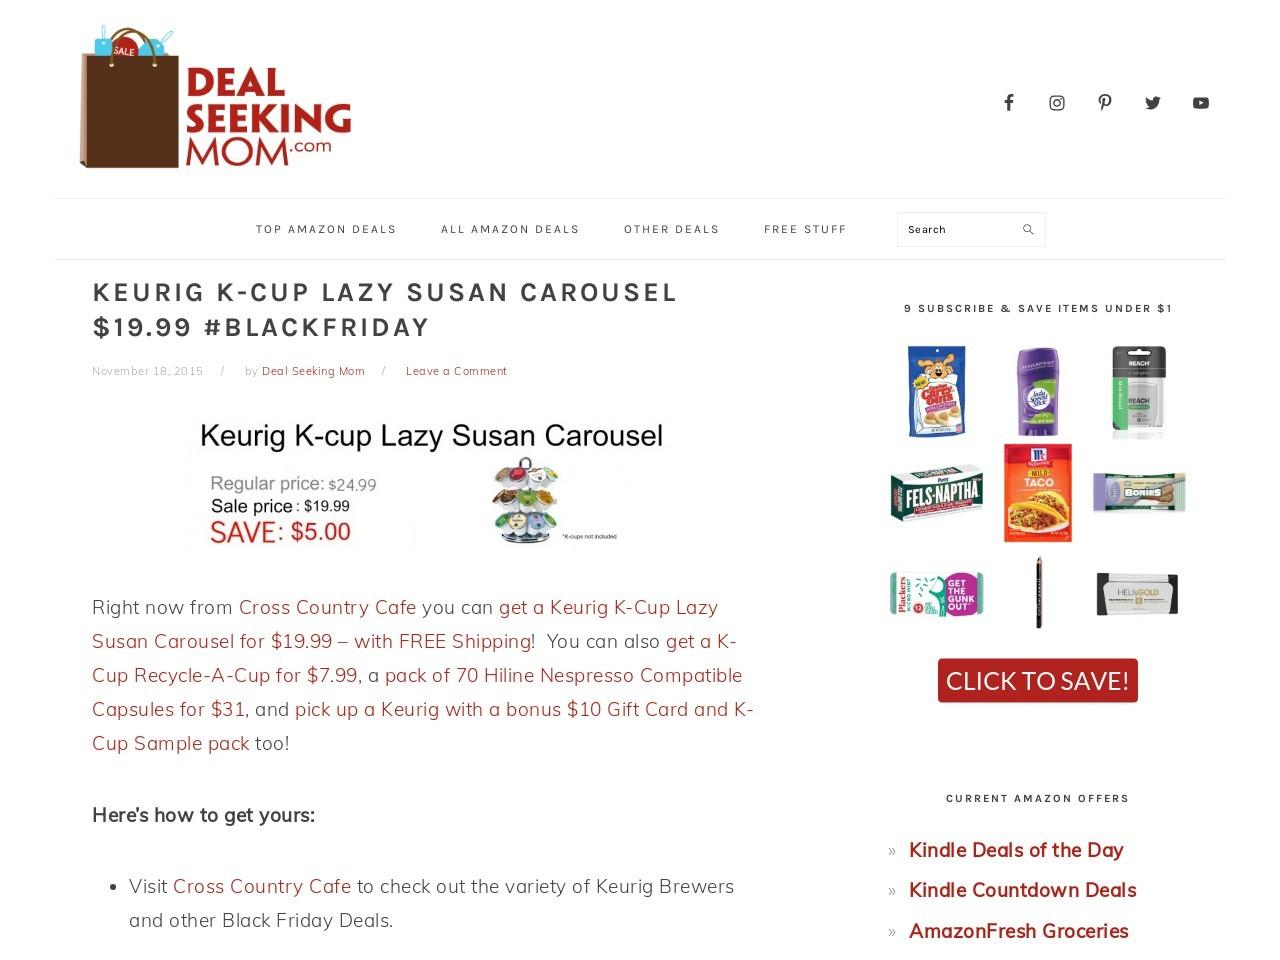 Keurig K-Cup Lazy Susan Carousel $19.99 #BlackFriday